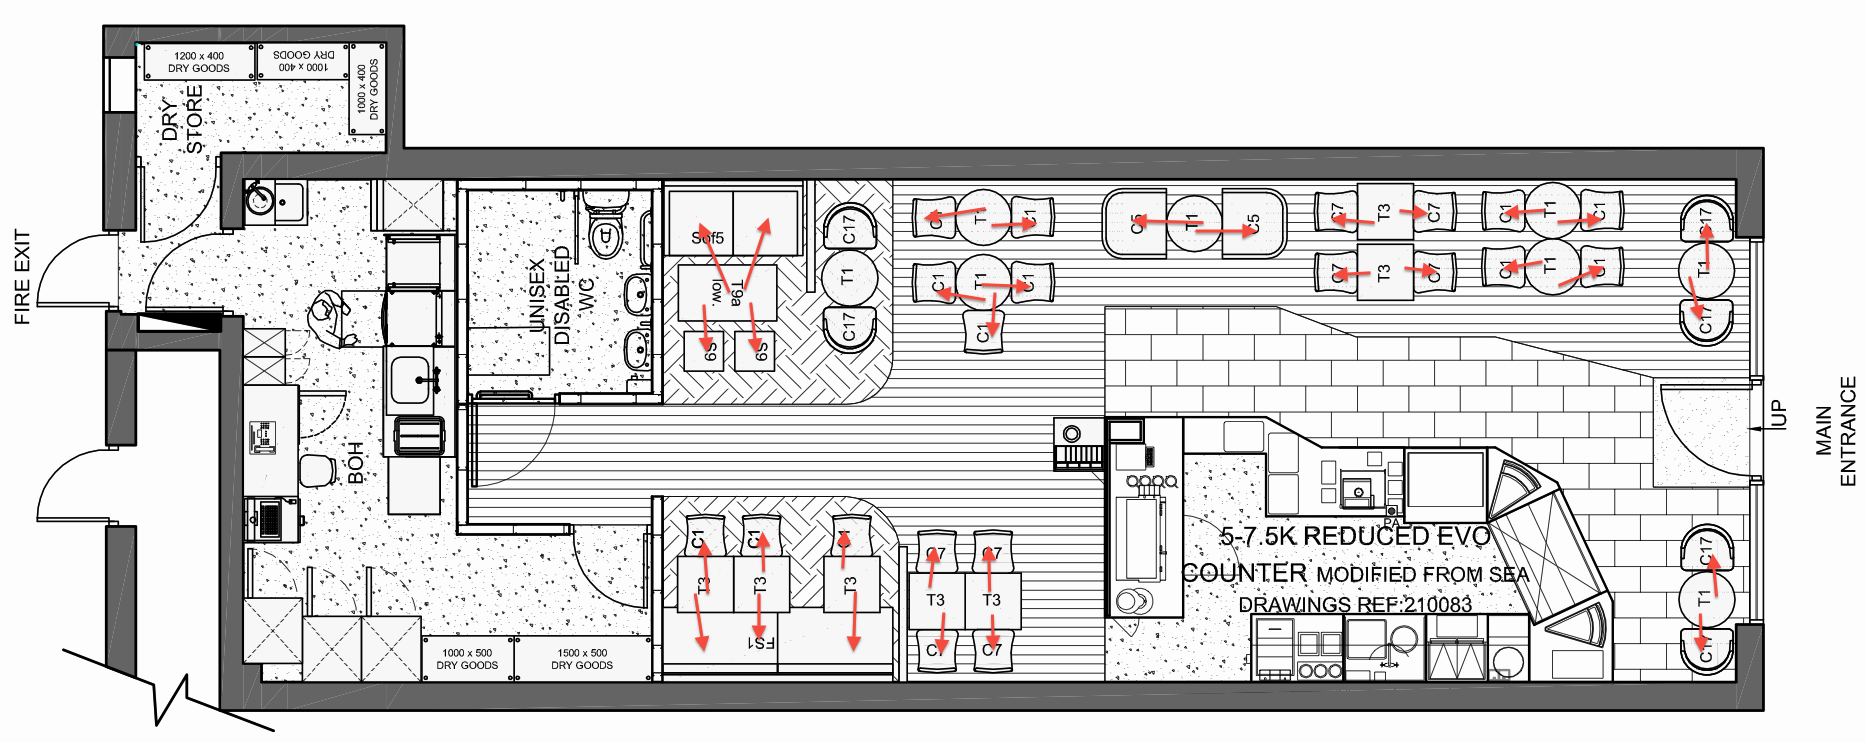 Znalezione obrazy dla zapytania caffe plans cafe pinterest cafes Free commercial bar design plans